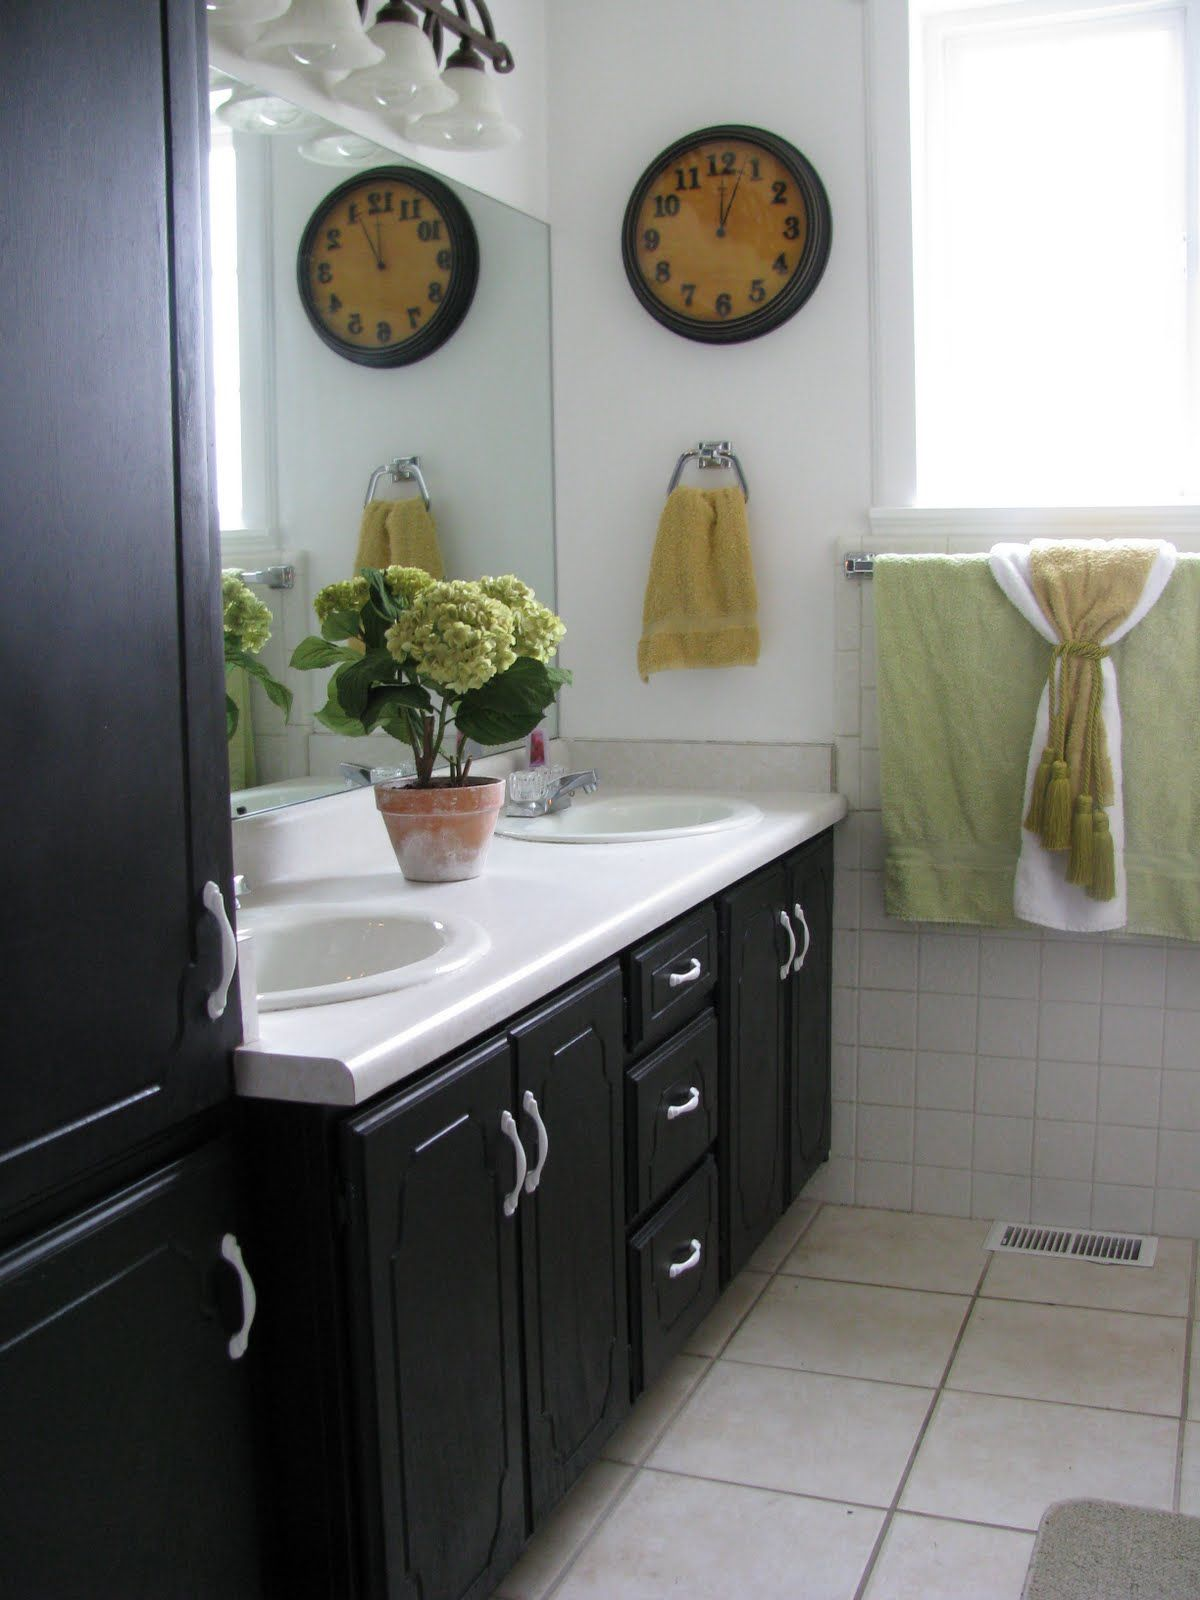 Black painted bathroom cabinets joys of home my home - Painting bathroom cabinets black ...